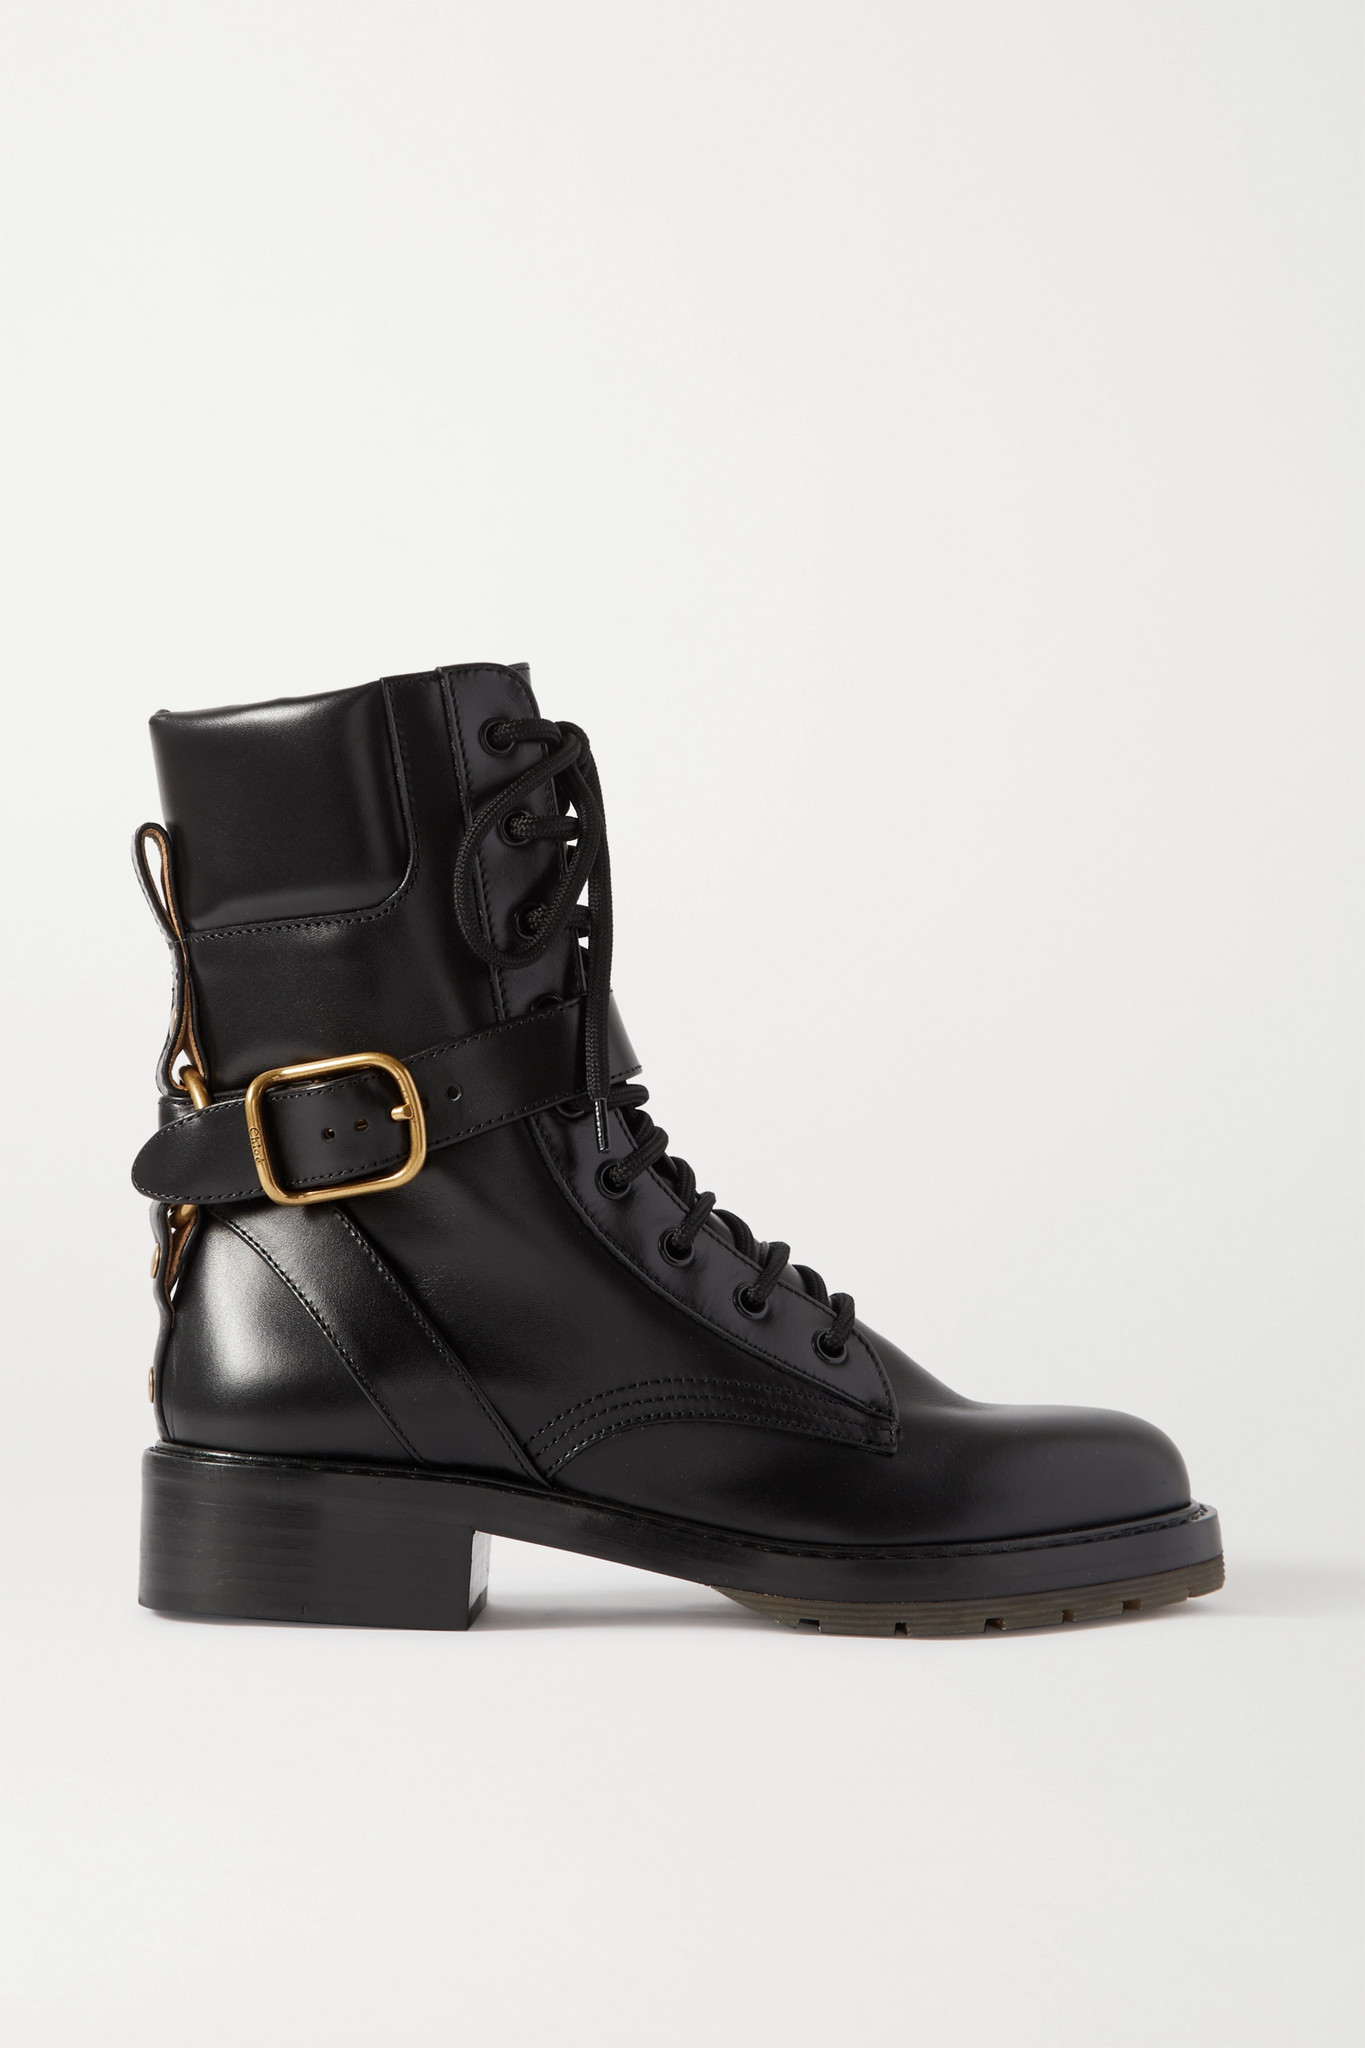 CHLOÉ - Diane 皮革踝靴 - 黑色 - IT36